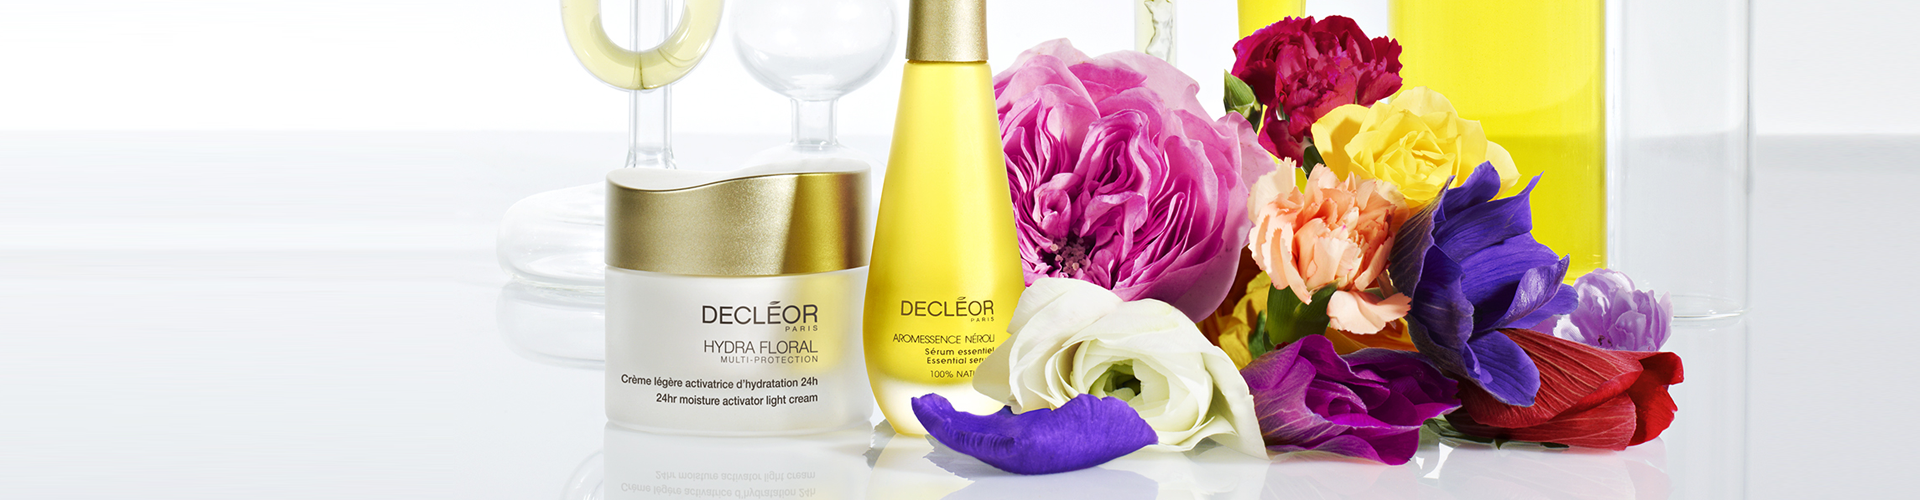 huidverzorging-decleor